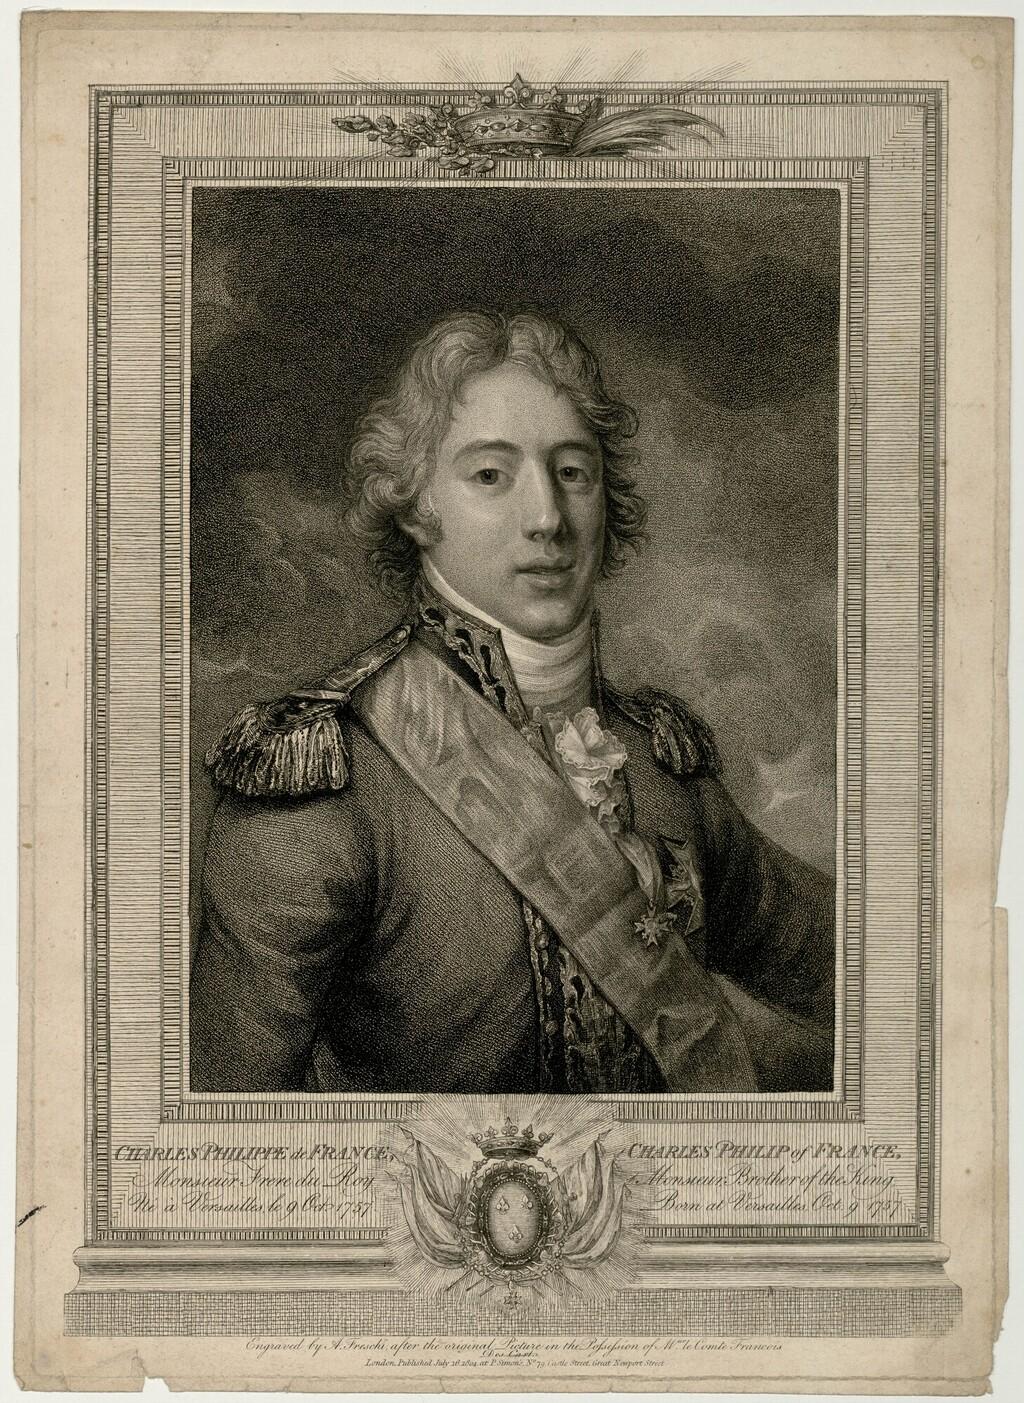 Le comte Charles-Philippe d'Artois, futur Charles X - Page 5 Image349